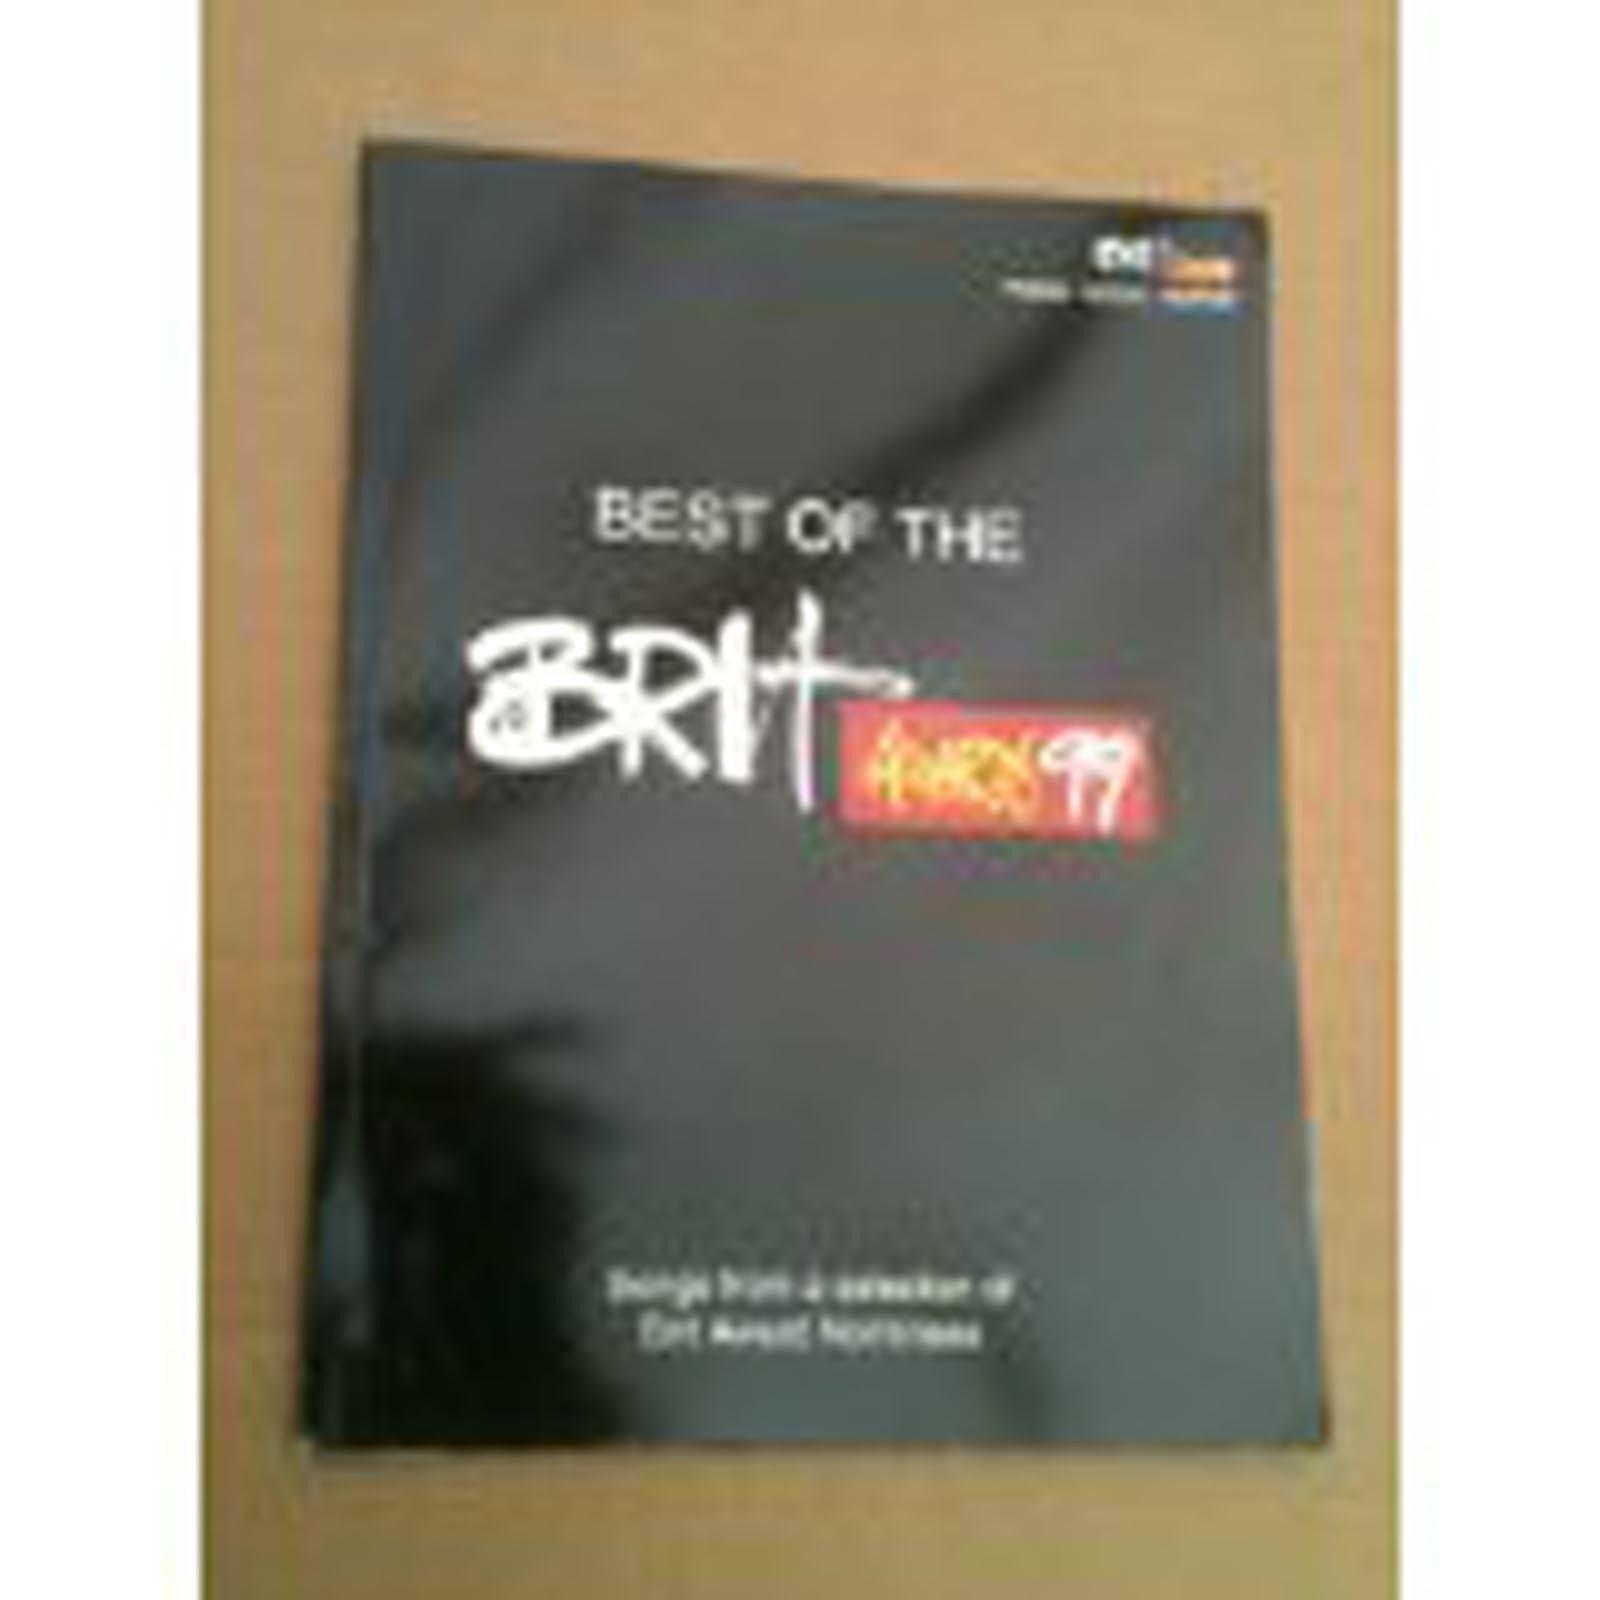 Best Of The Brit Awards 99 Piano Vocal Guitar Sheet Music Songbook Jamiroqua S67